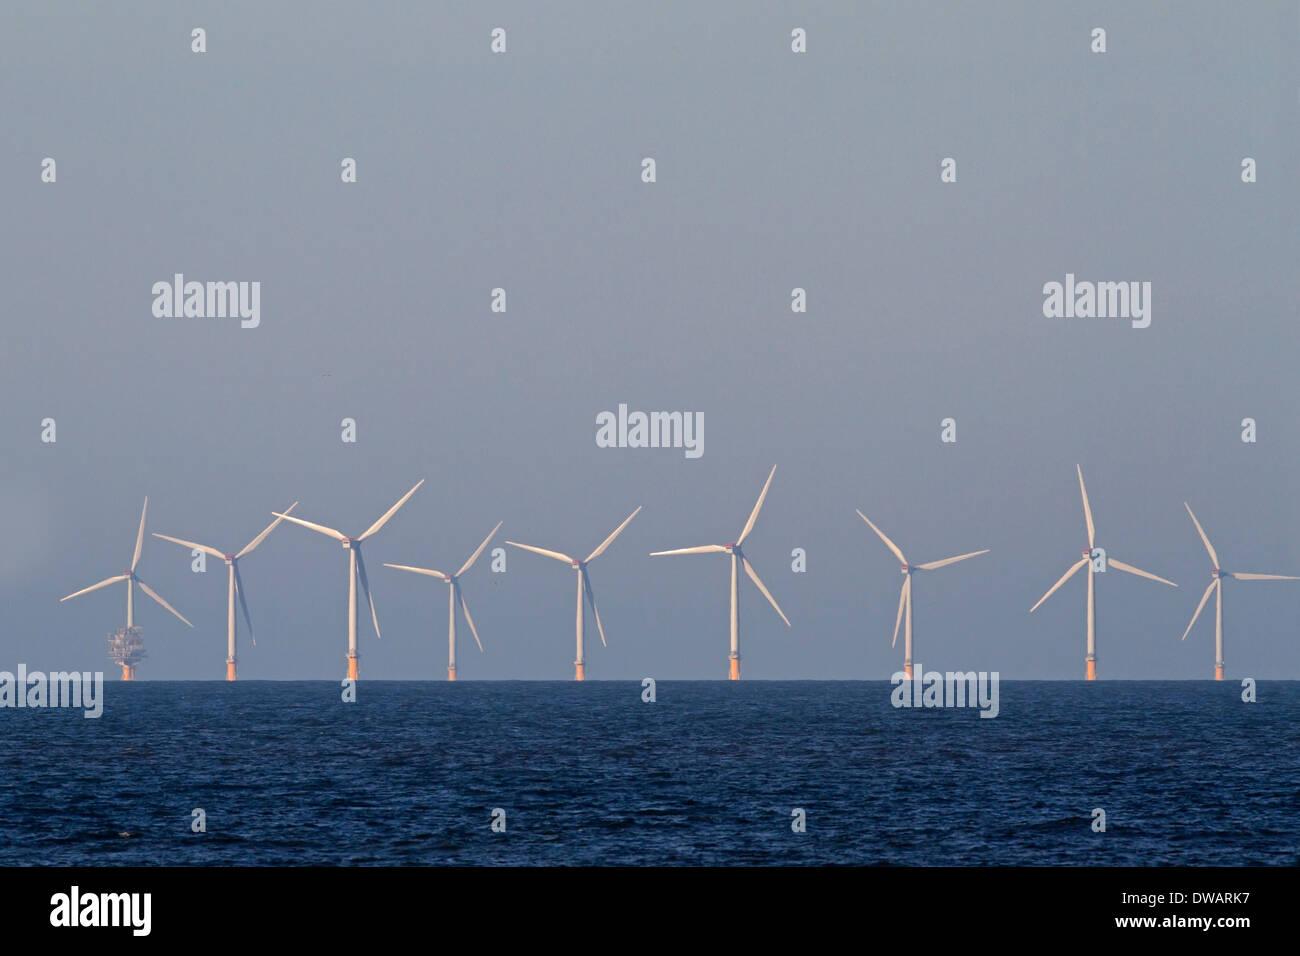 Off-shore wind turbines, Sheringham shoal, Norfolk UK - Stock Image